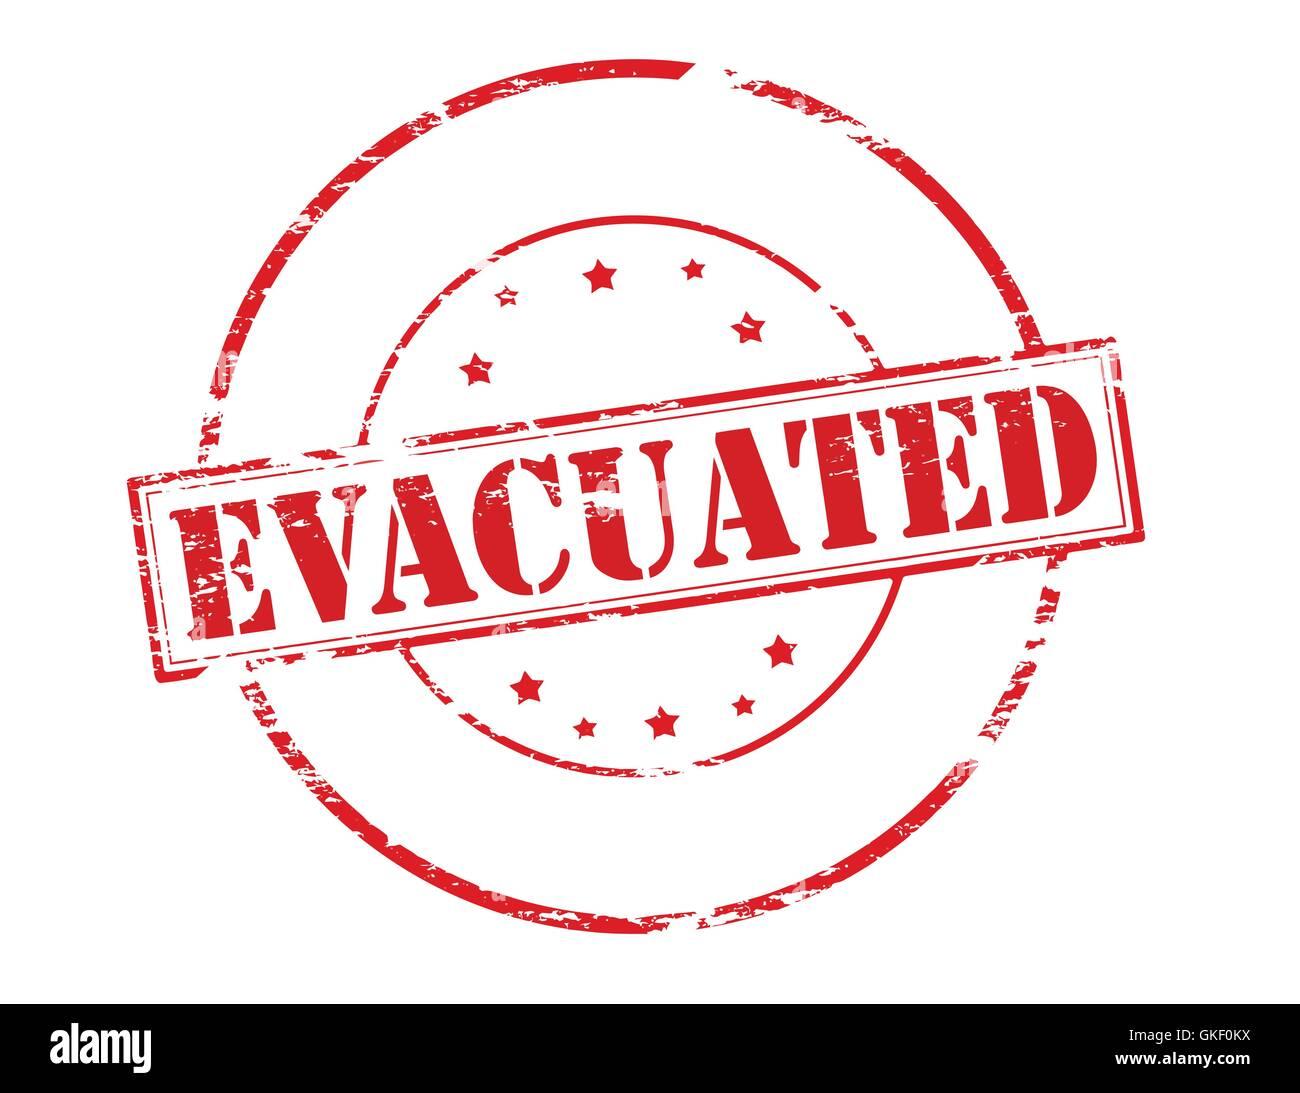 Evacuated - Stock Vector